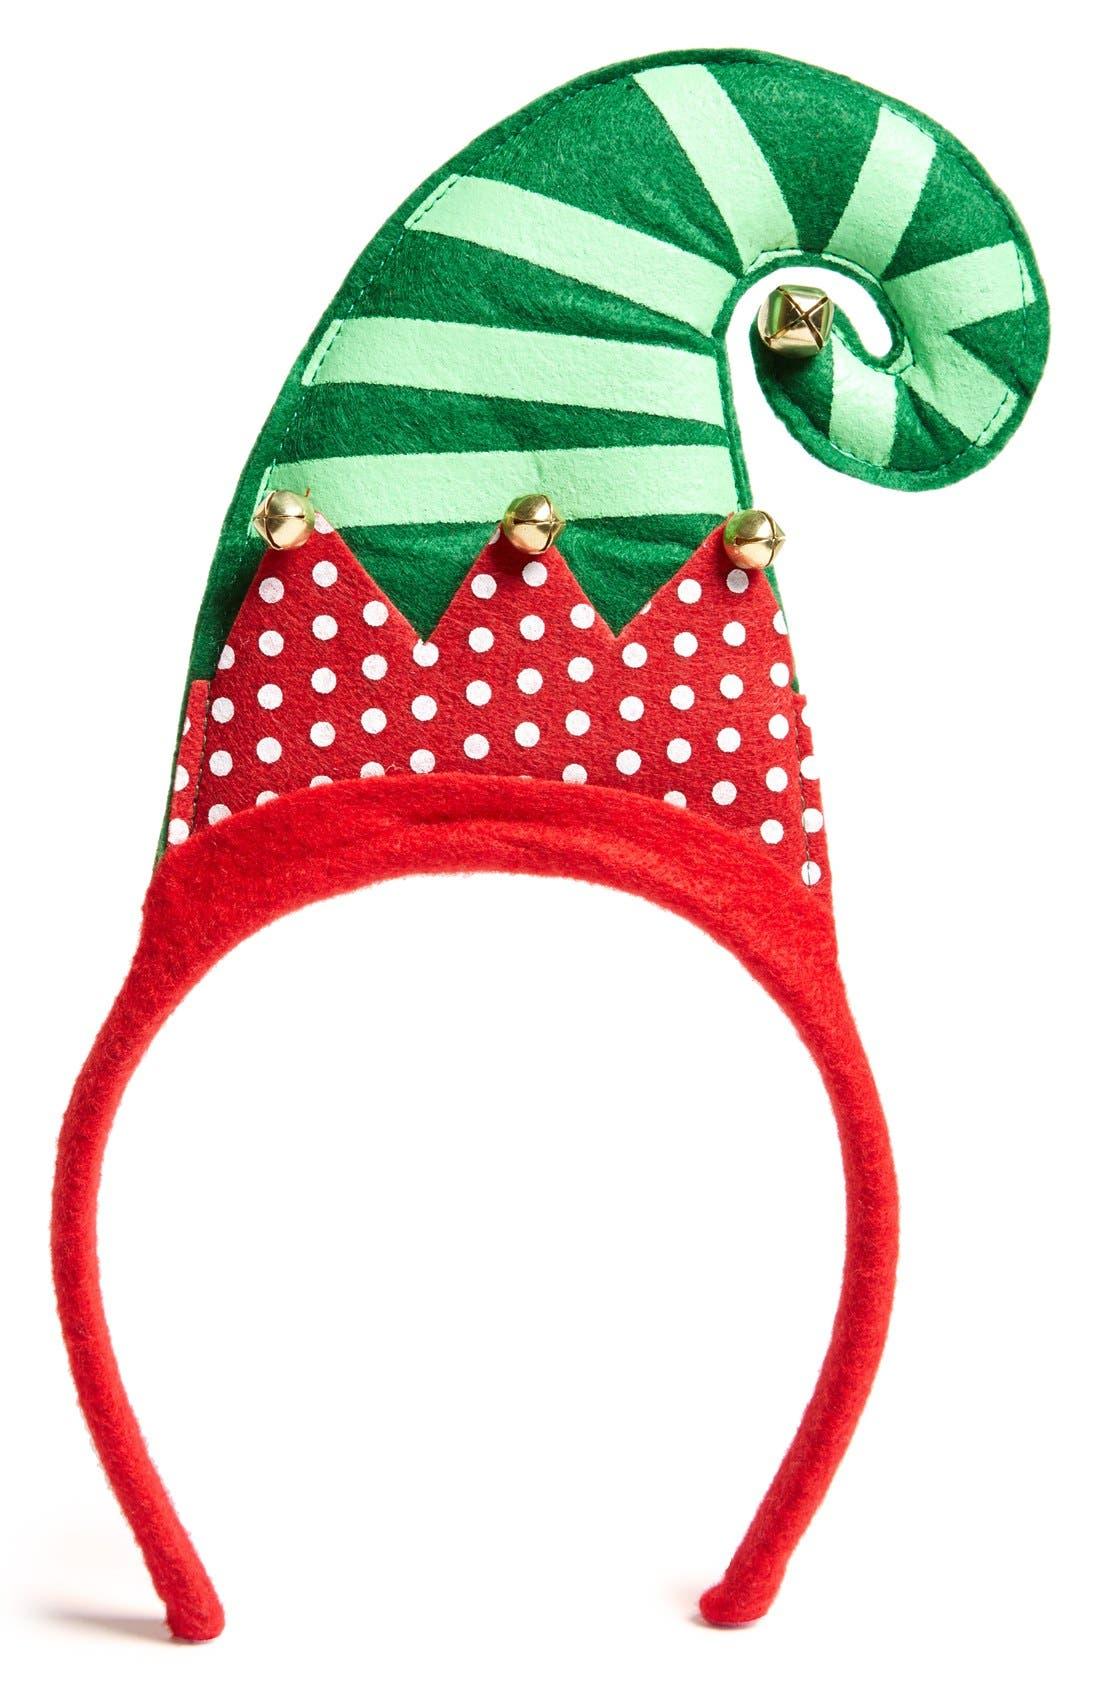 Alternate Image 1 Selected - Capelli of New York Elf Hat Headband